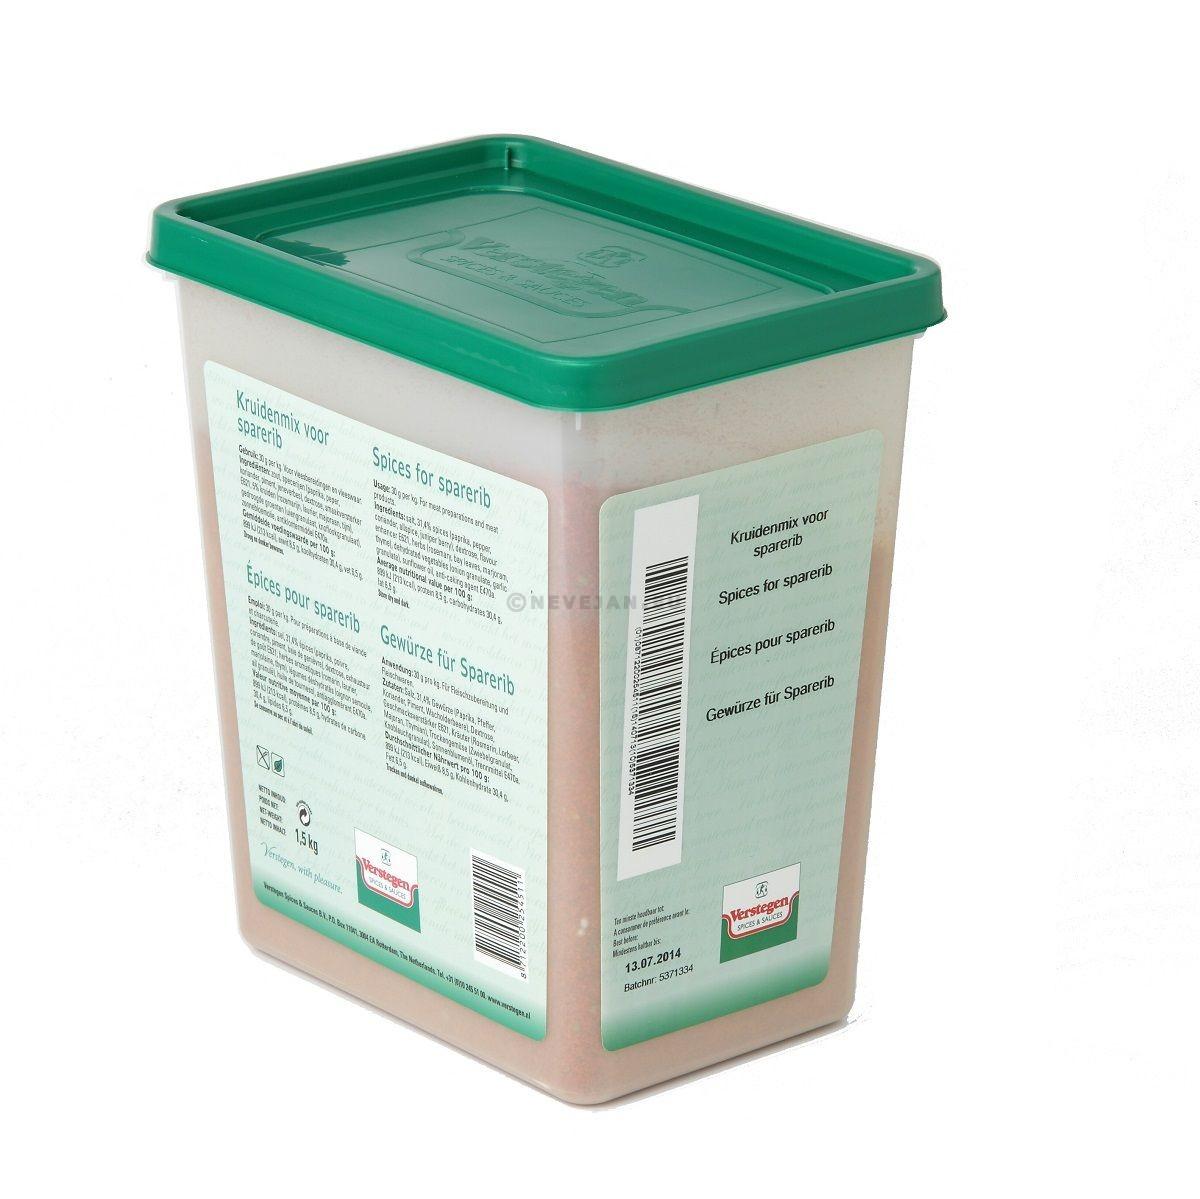 Verstegen Spare Ribkruiden 1.6kg 3LP